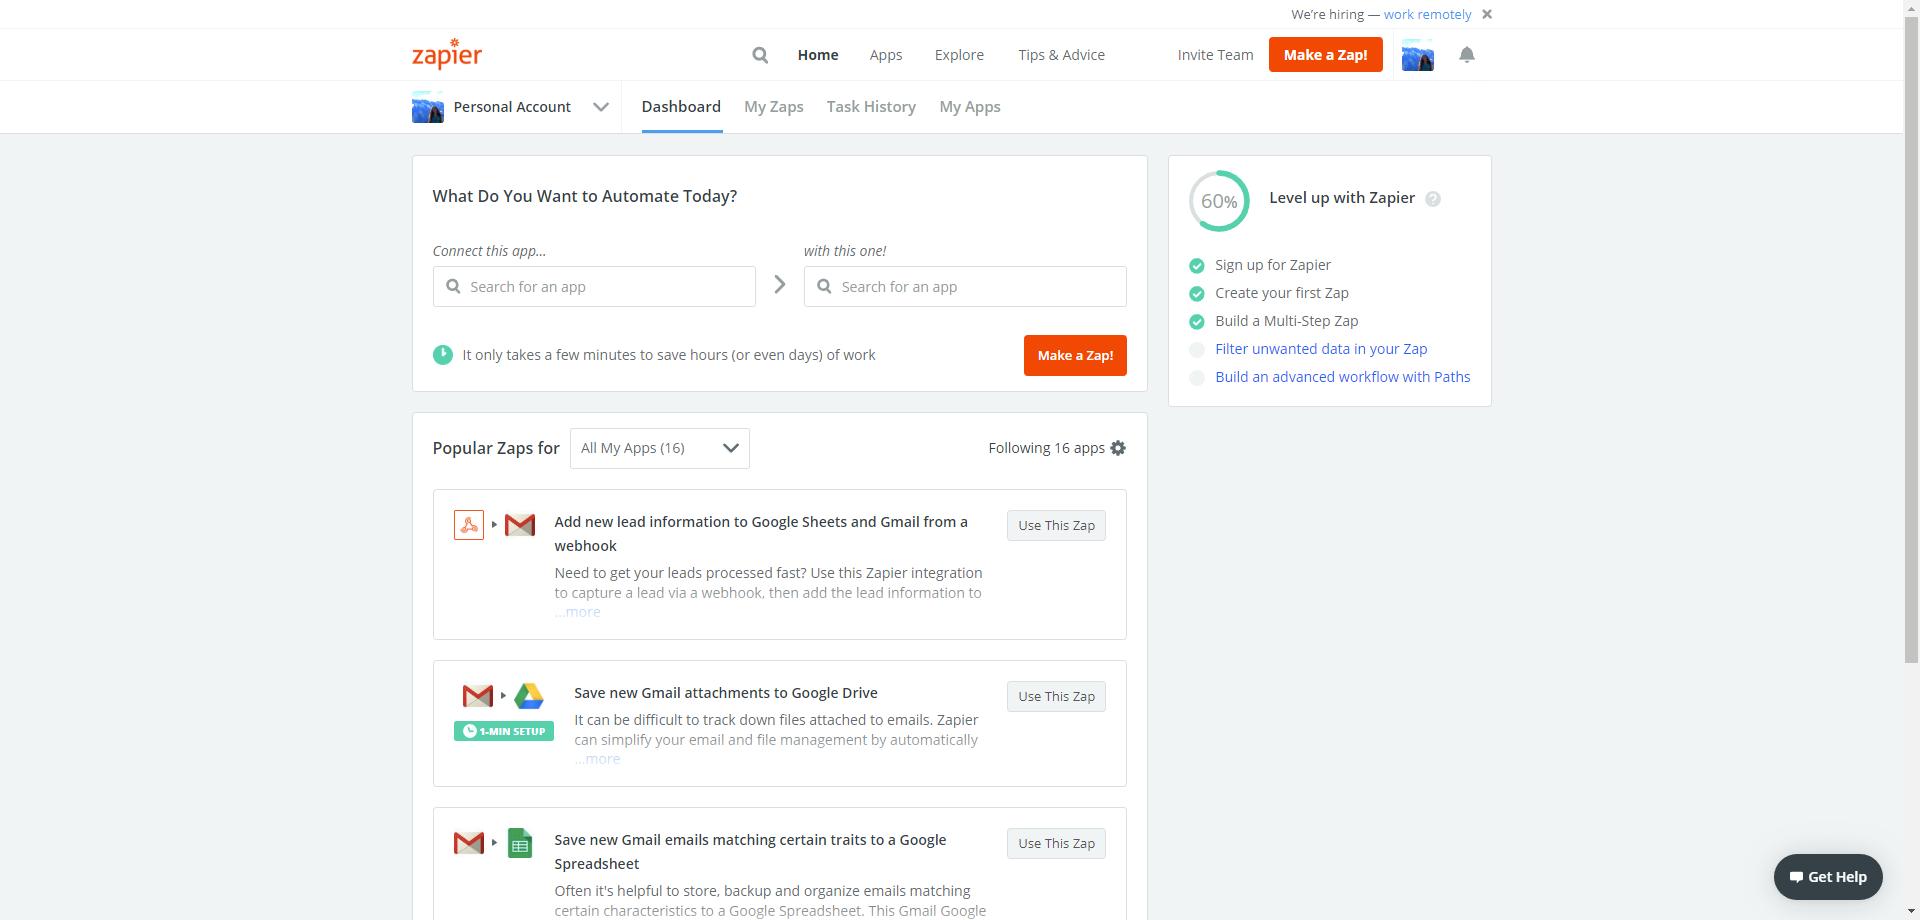 Process Street + Office 365 integration - make a zap